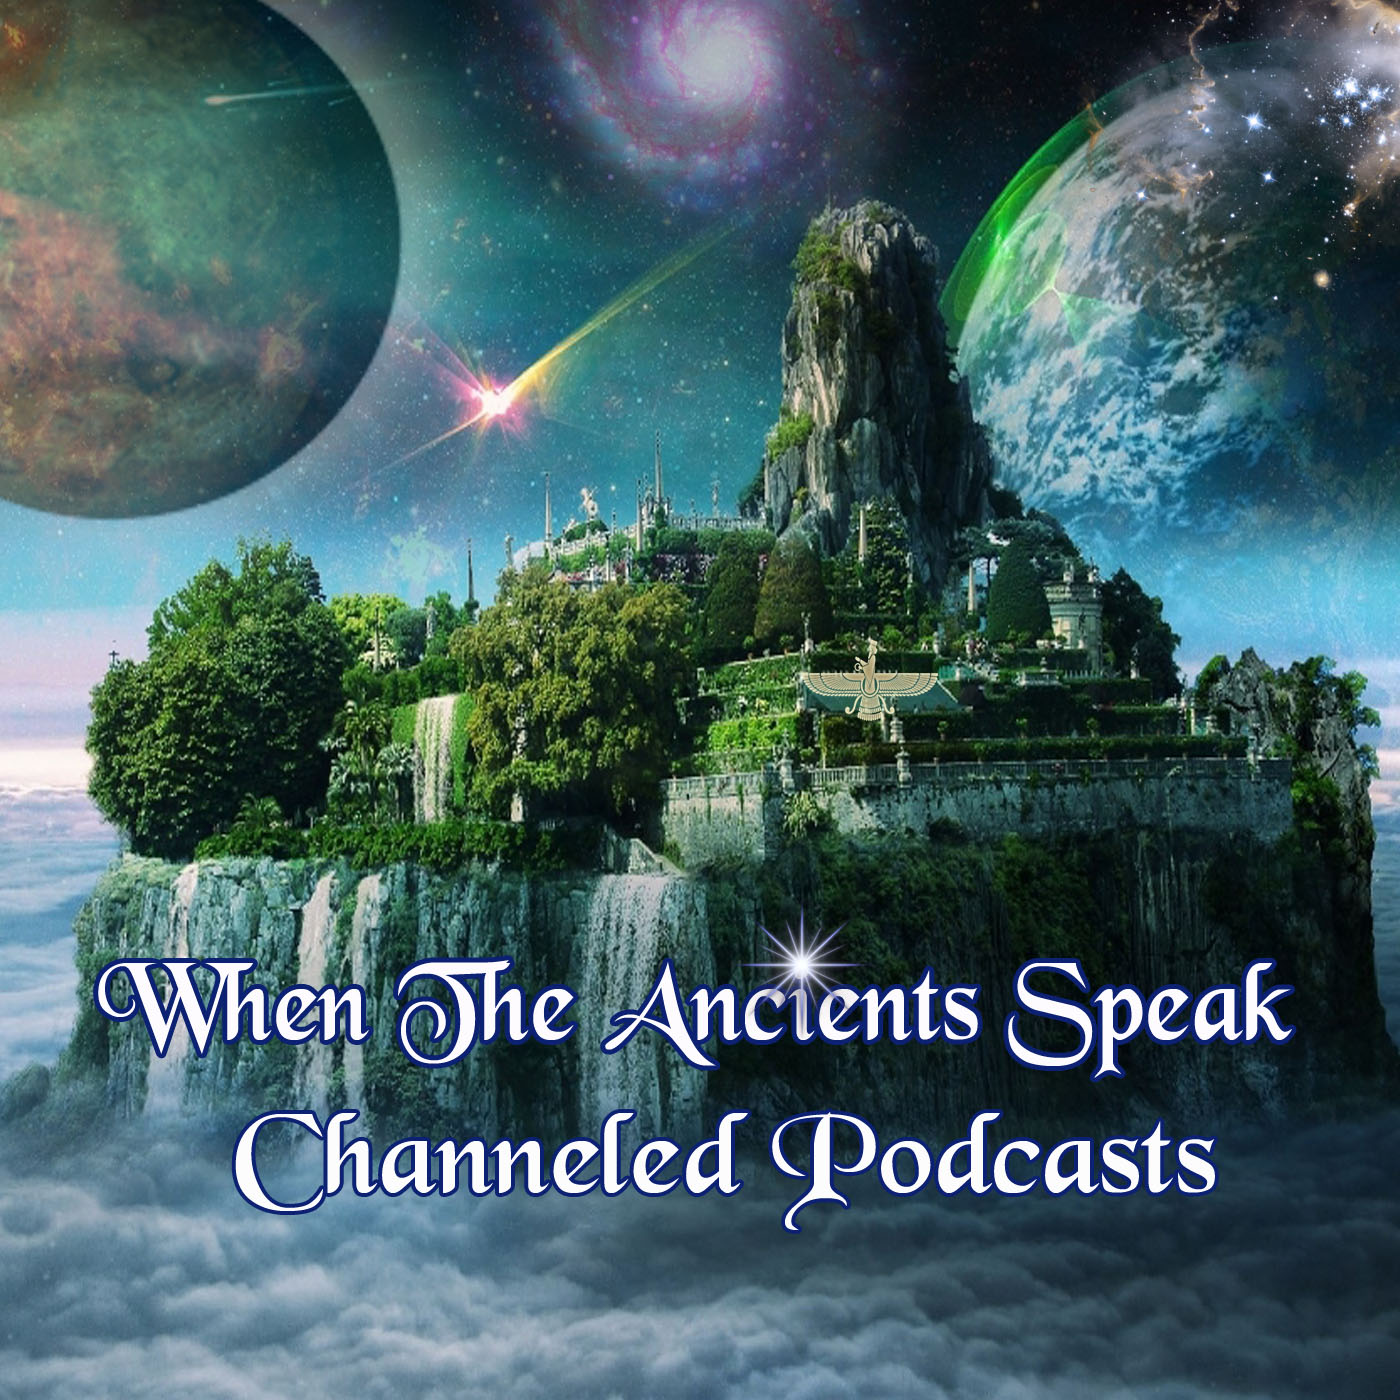 When The Ancients Speak